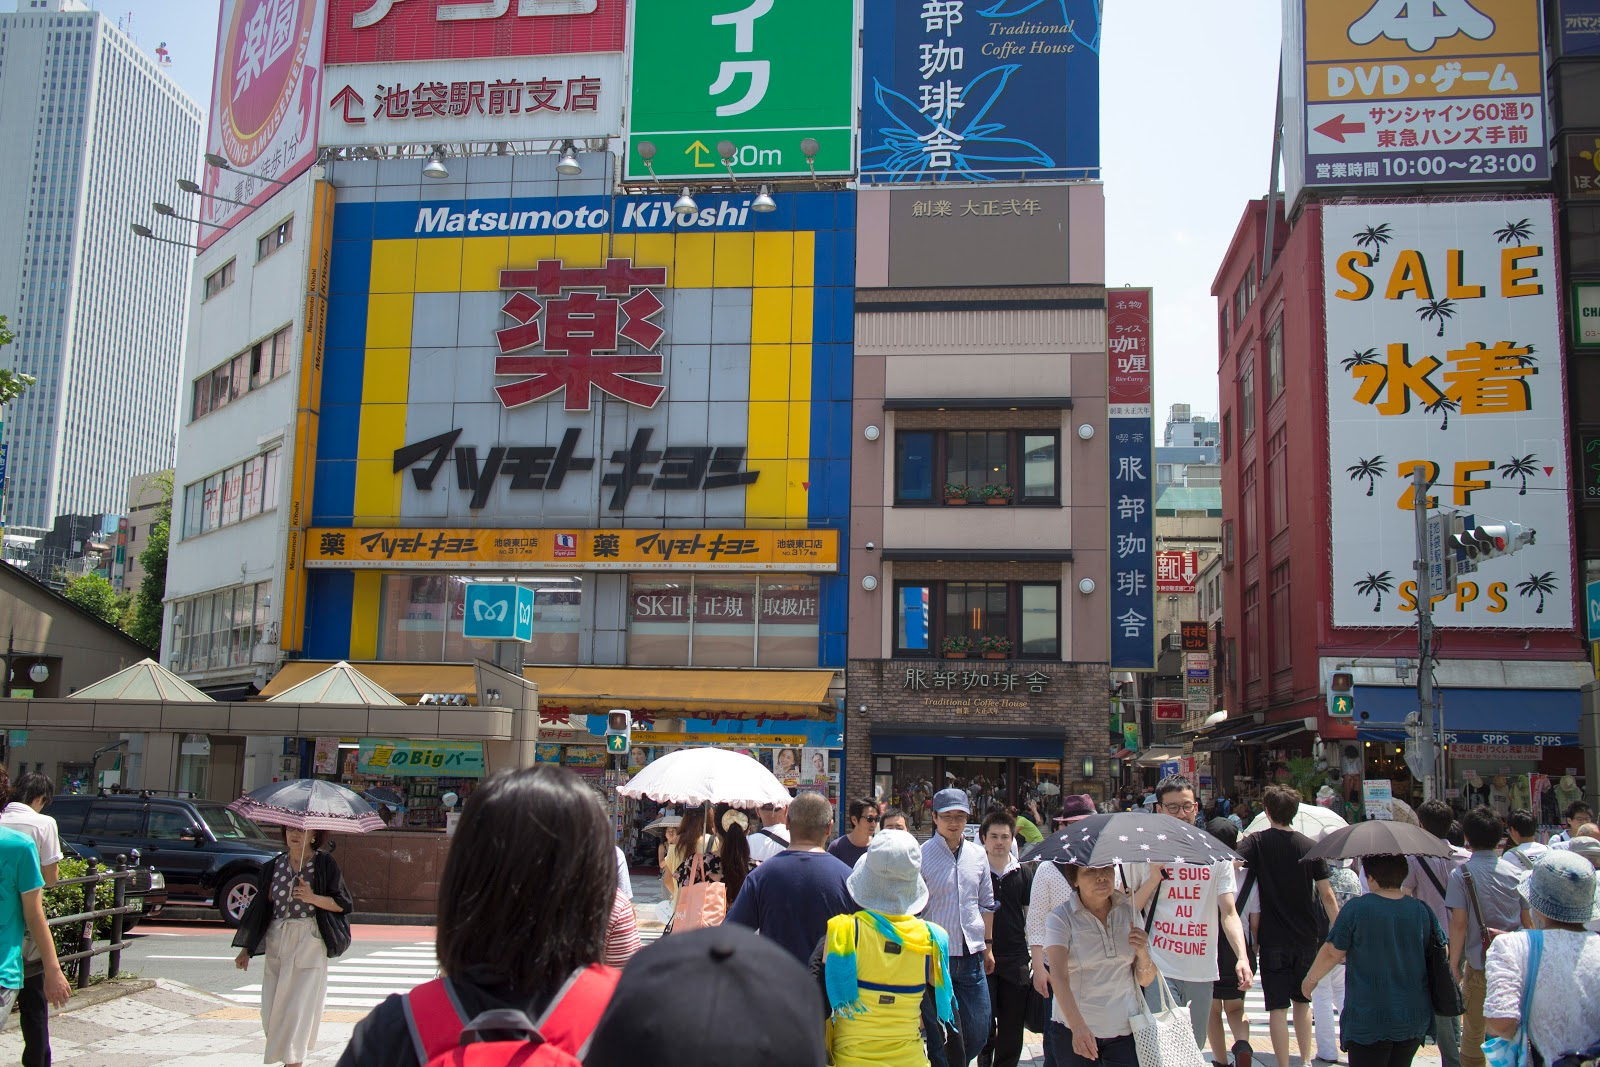 Day Ikebukuro Animates New Store Artnia Square Enix Shinjuku - Cleaning invoice template free square enix online store